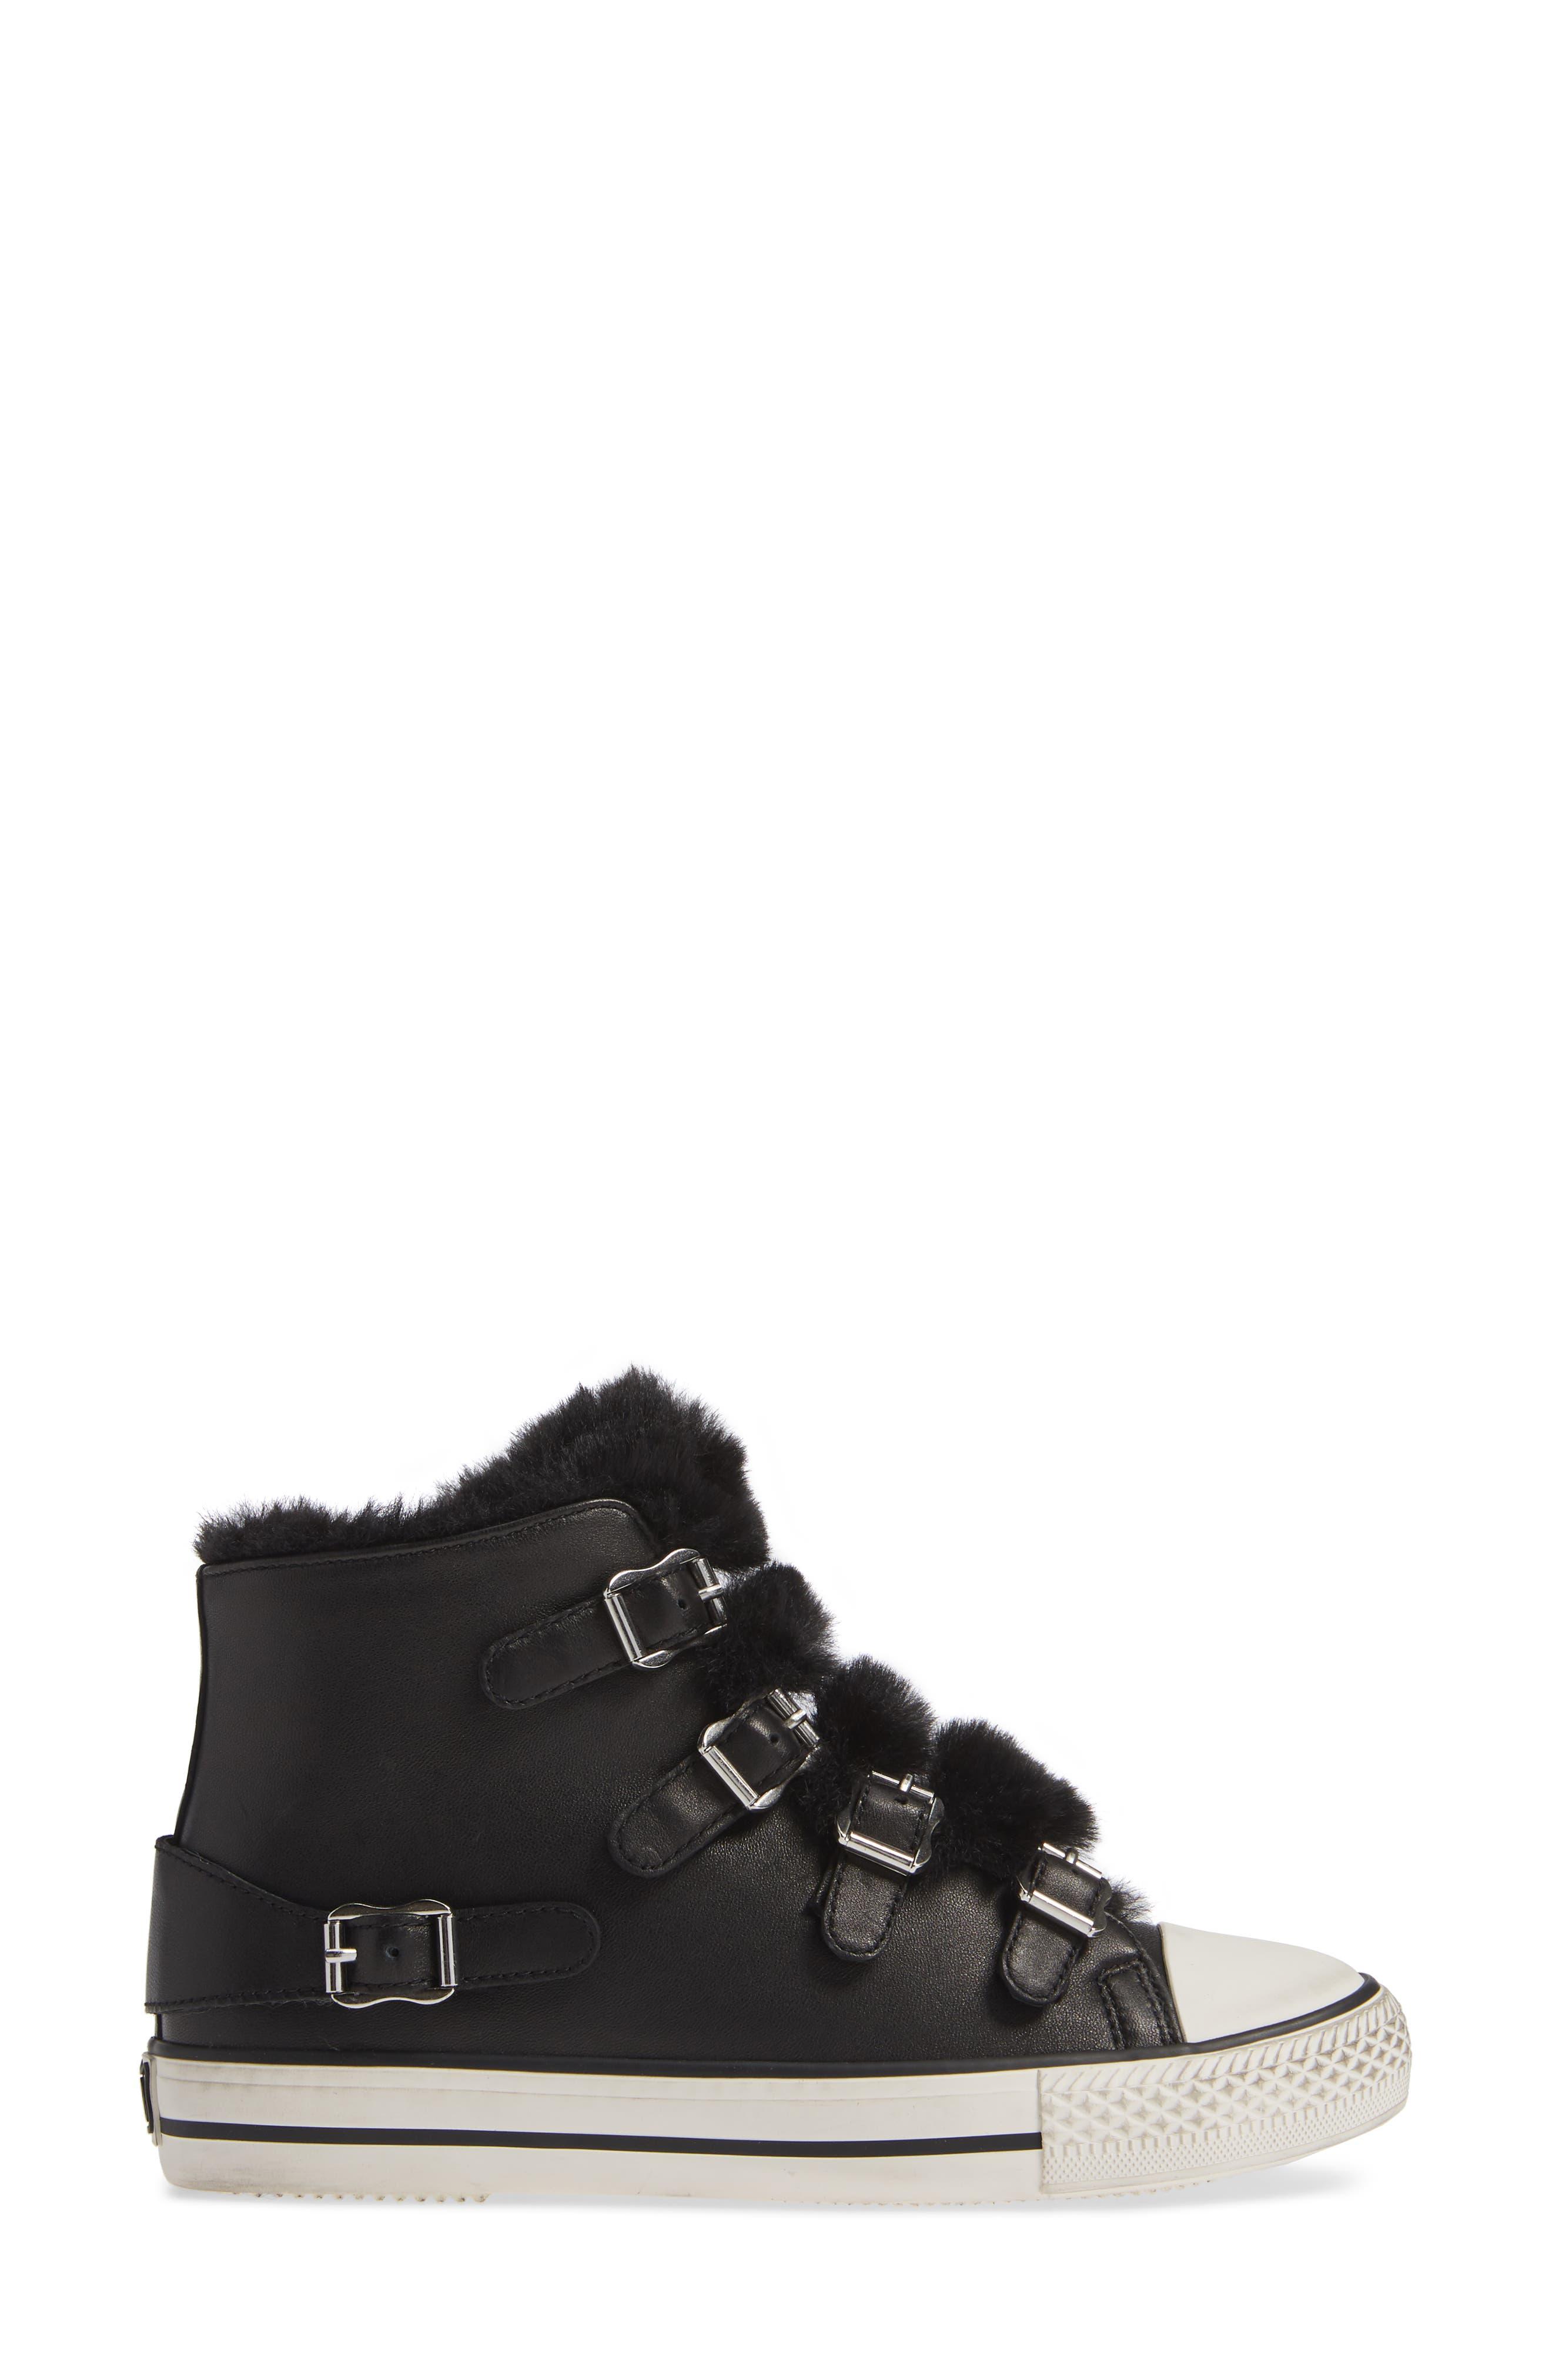 ASH, Valko High Top Sneaker, Alternate thumbnail 3, color, BLACK/ BLACK FAUX FUR